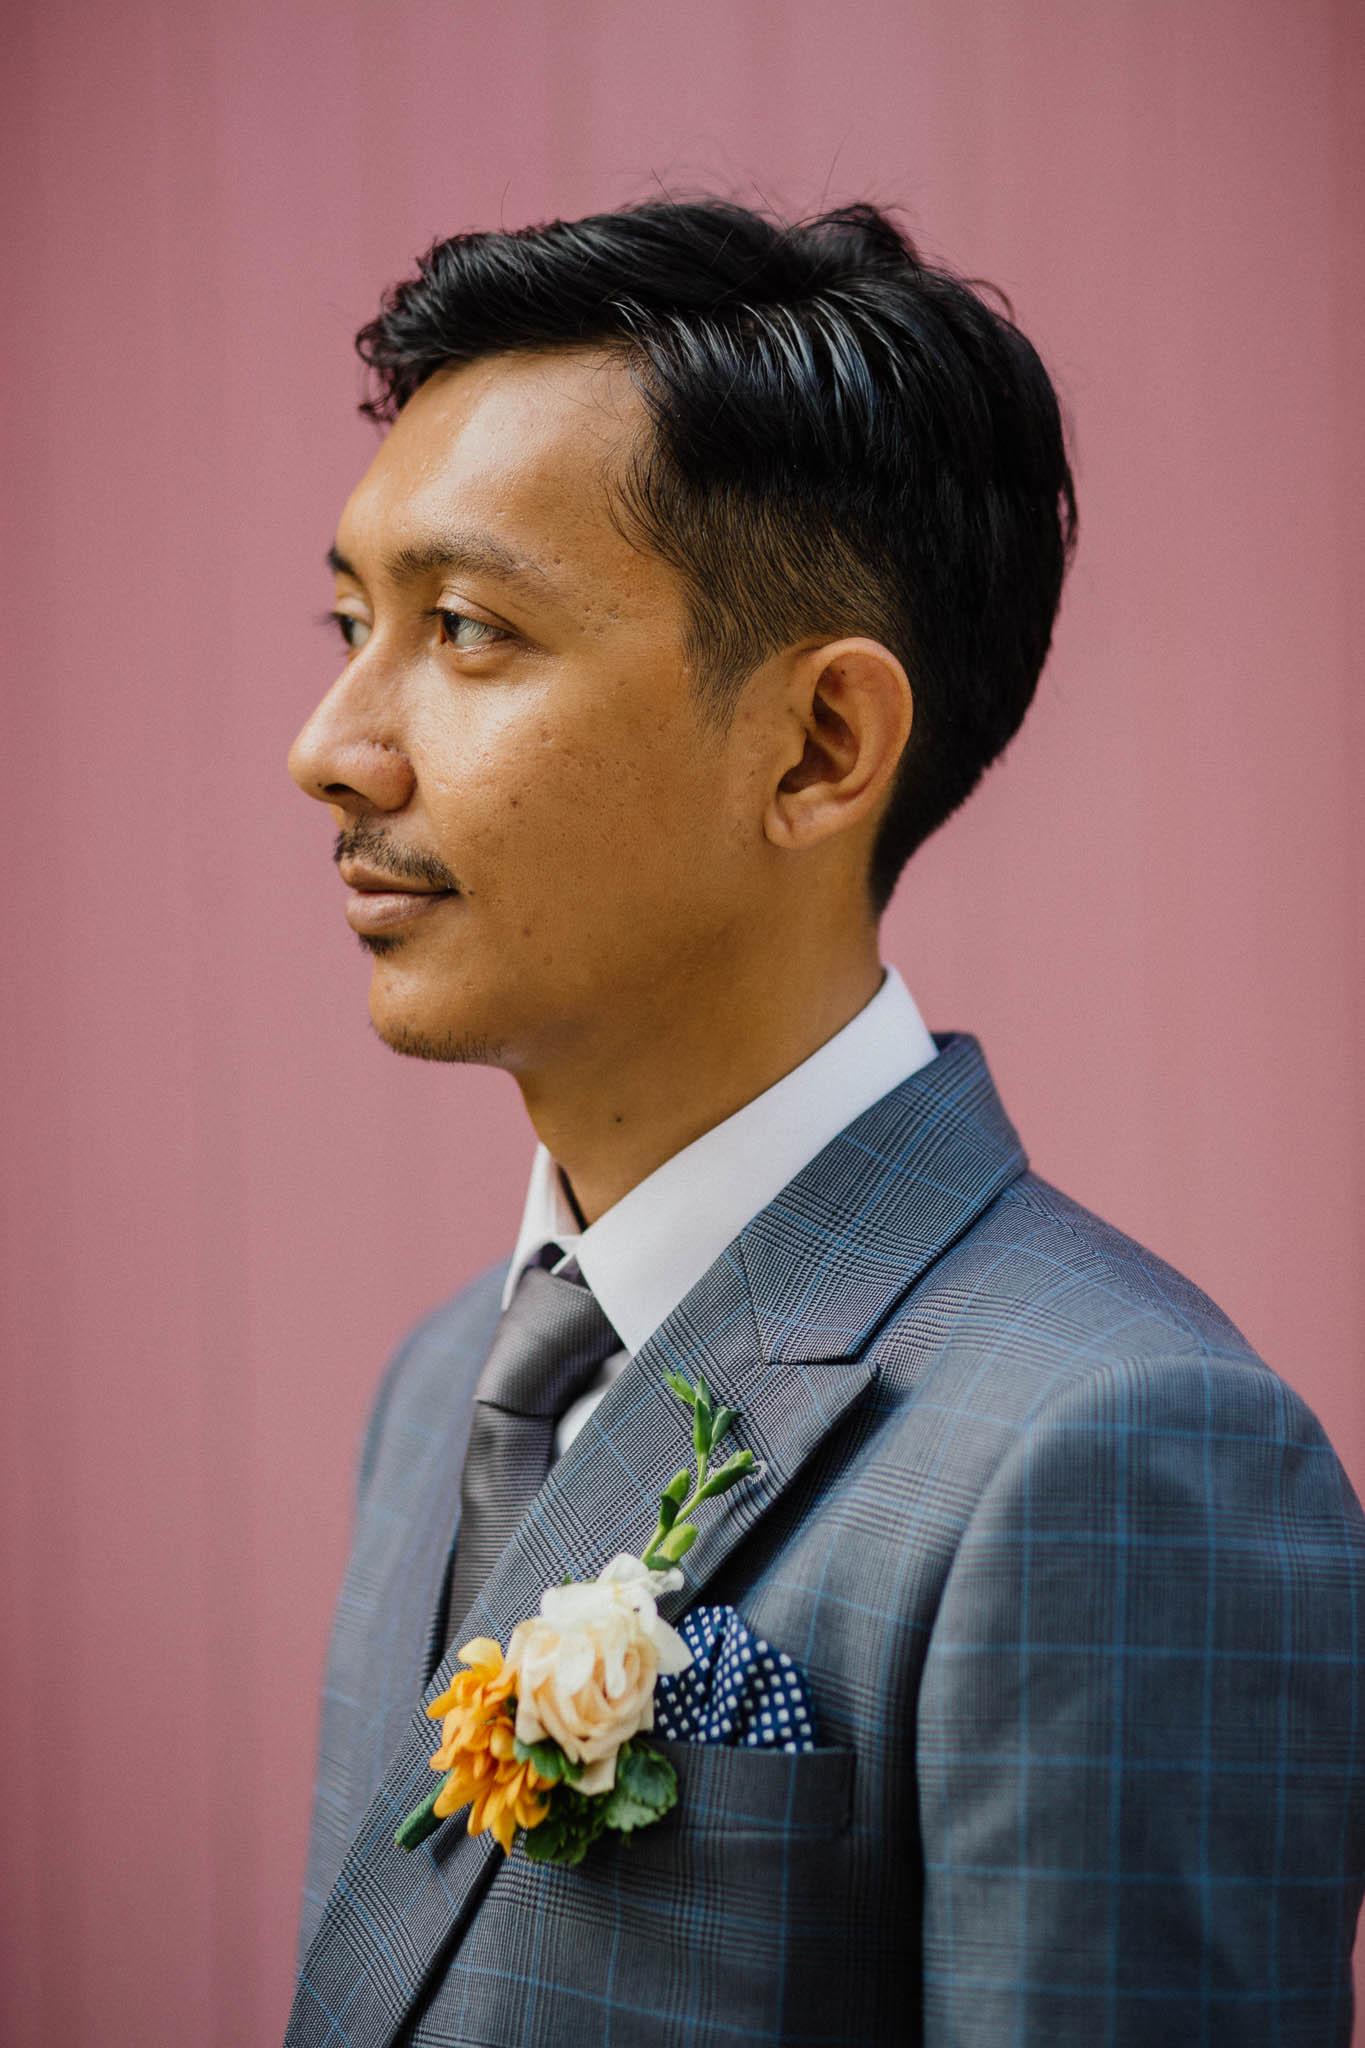 singapore-wedding-photographer-wedding-nufail-addafiq-082.jpg